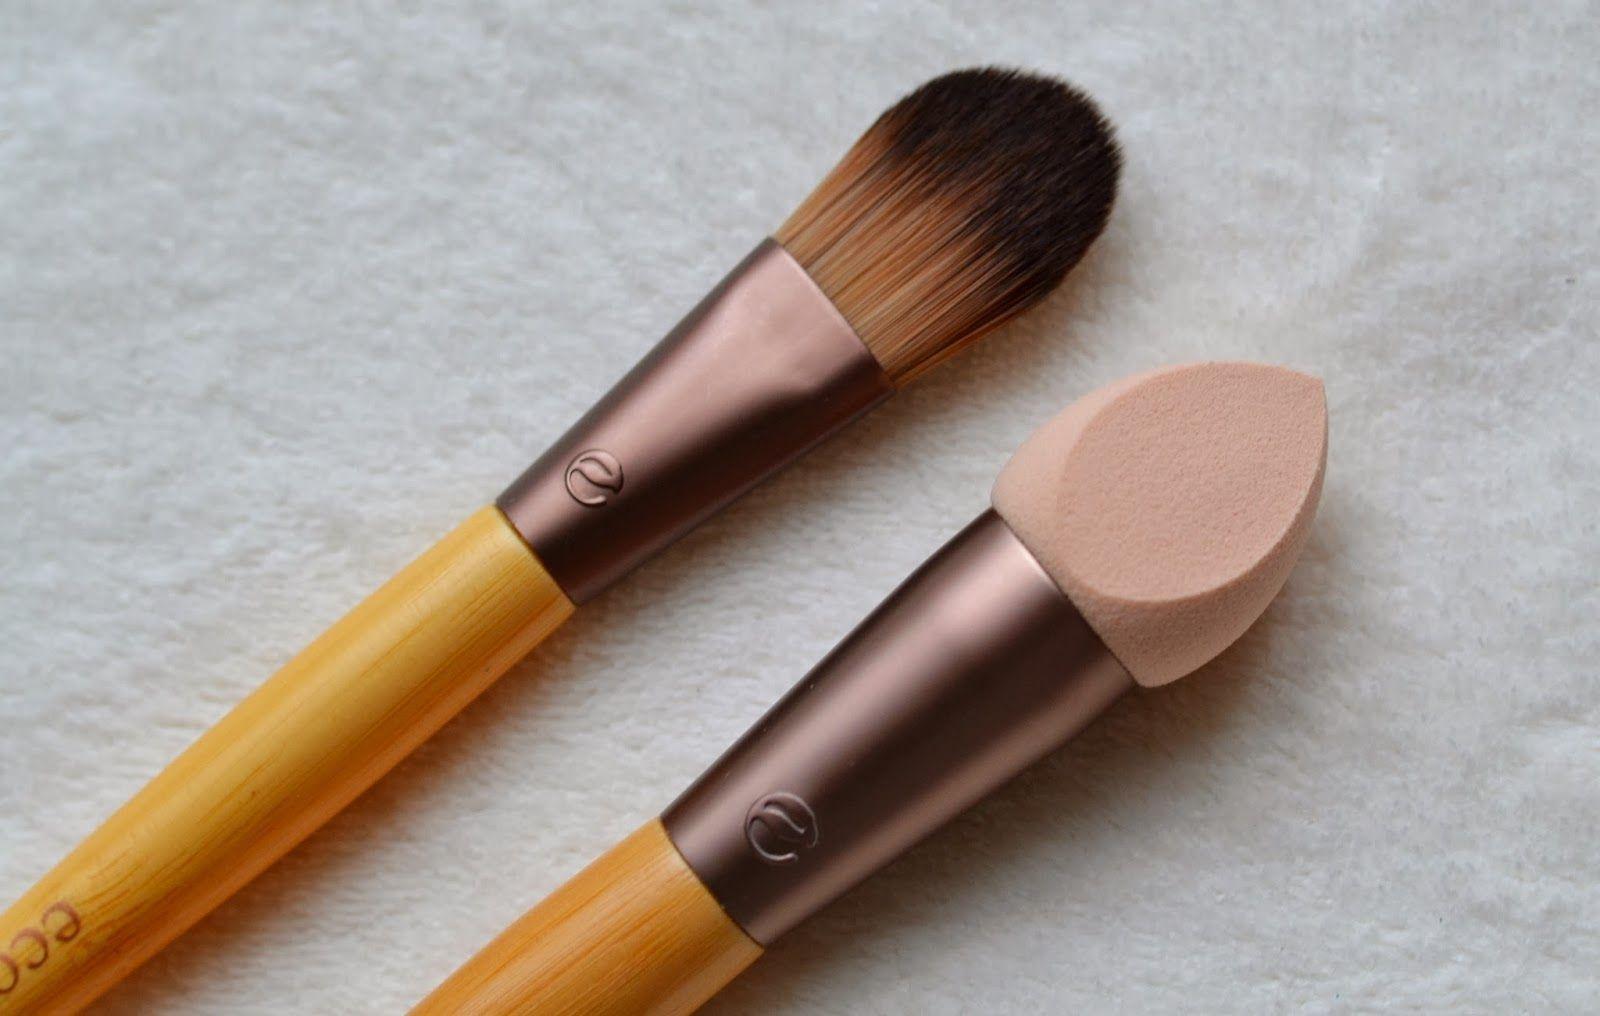 Eco Makeup Sponge Saubhaya Tools 1616 Perfecting Duo London Beauty Queen Techniques Foundation Brush Vs Applicator